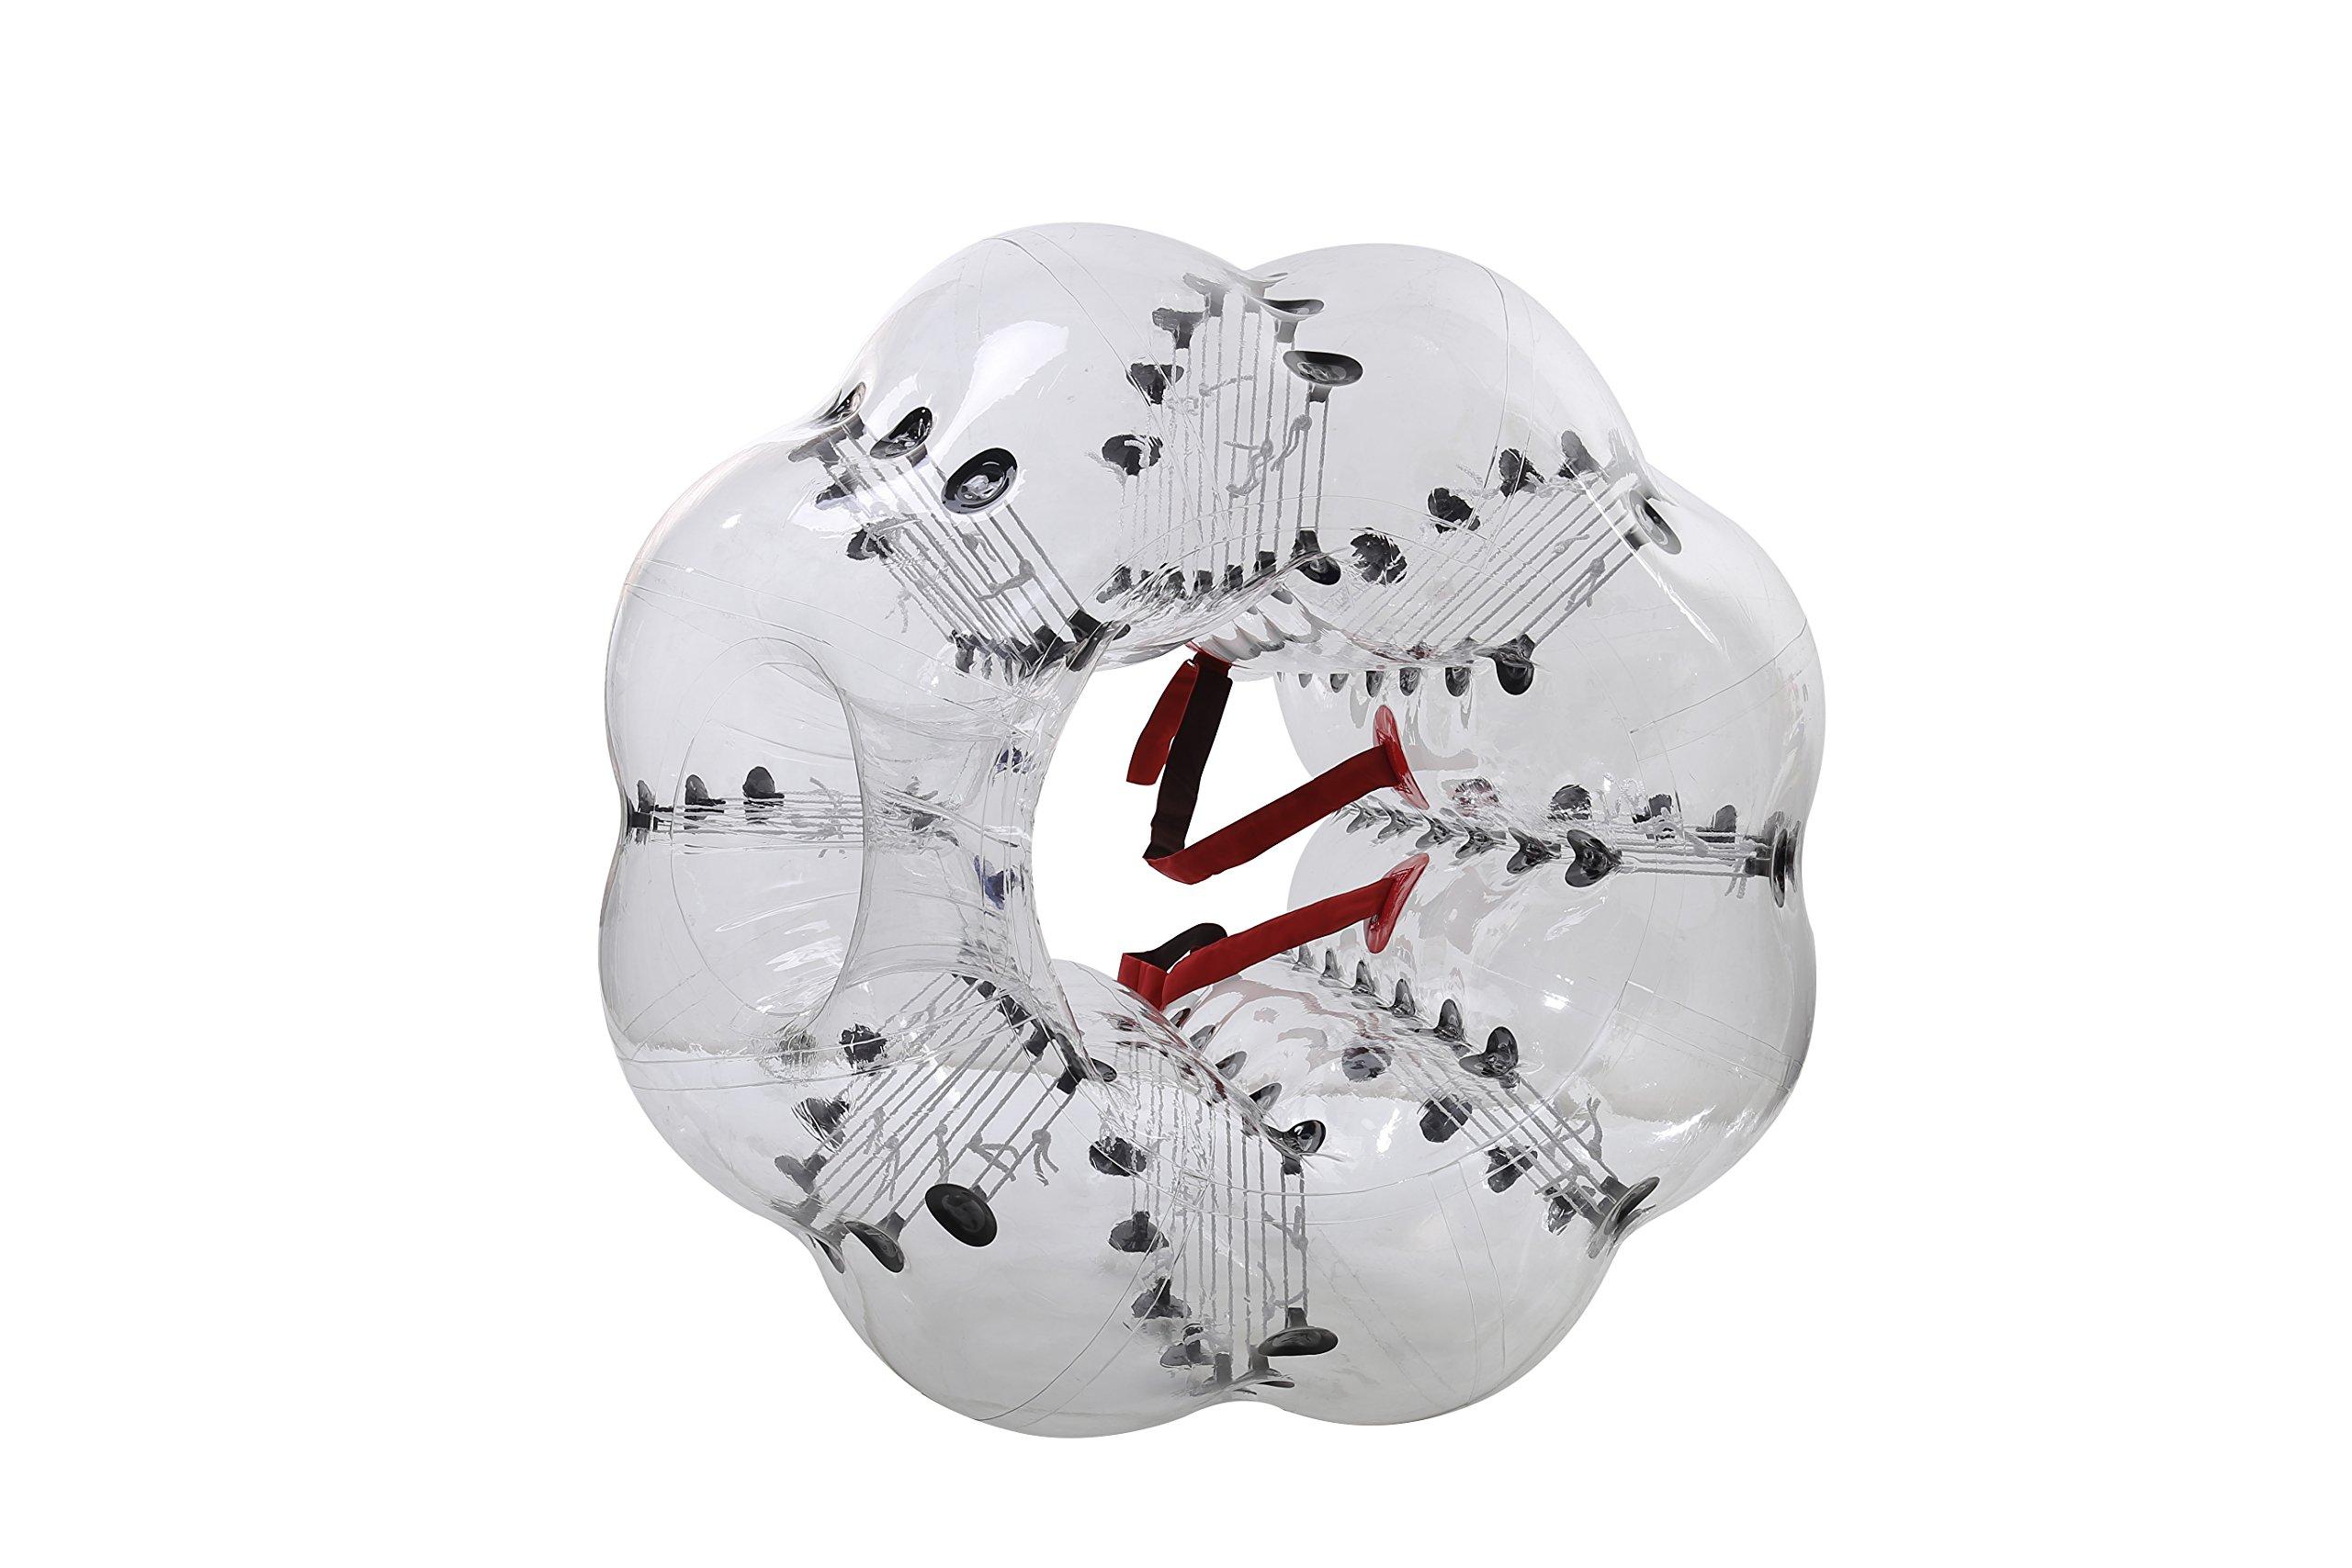 Bubble Soccer Balls Dia 5' (1.5m) Human Hamster Ball, Bubble Football,Bumper Ball, Zorbing Ball, Knocker Ball, smash ball stress ball Loopy Ball ( New Black Dot) by Garybank (Image #4)